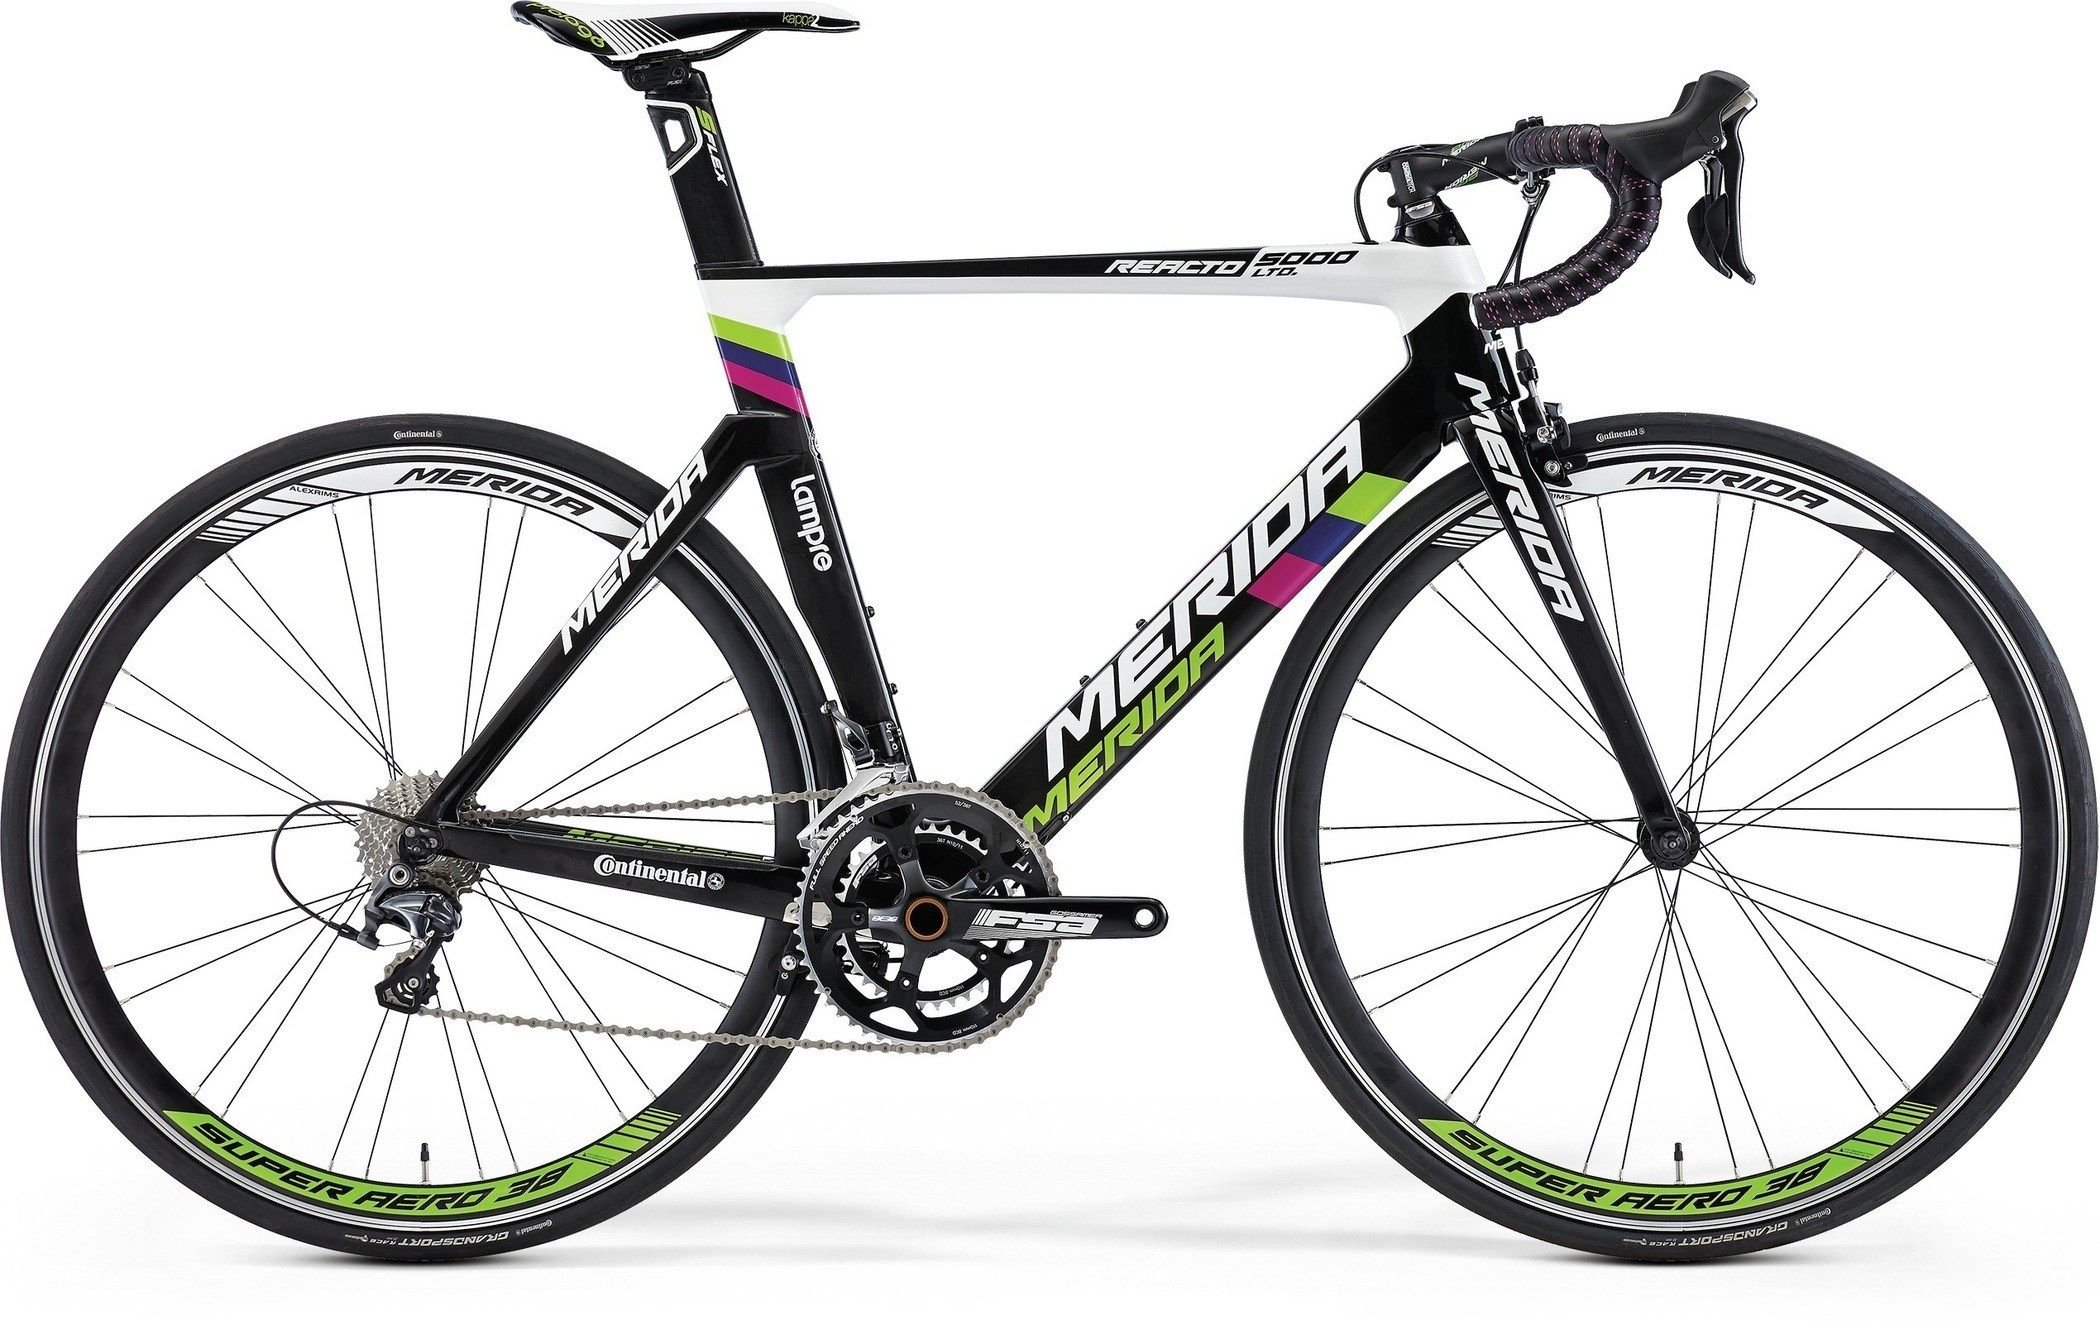 Reacto 5000 Ltd Road Fitness Merida Bikes International